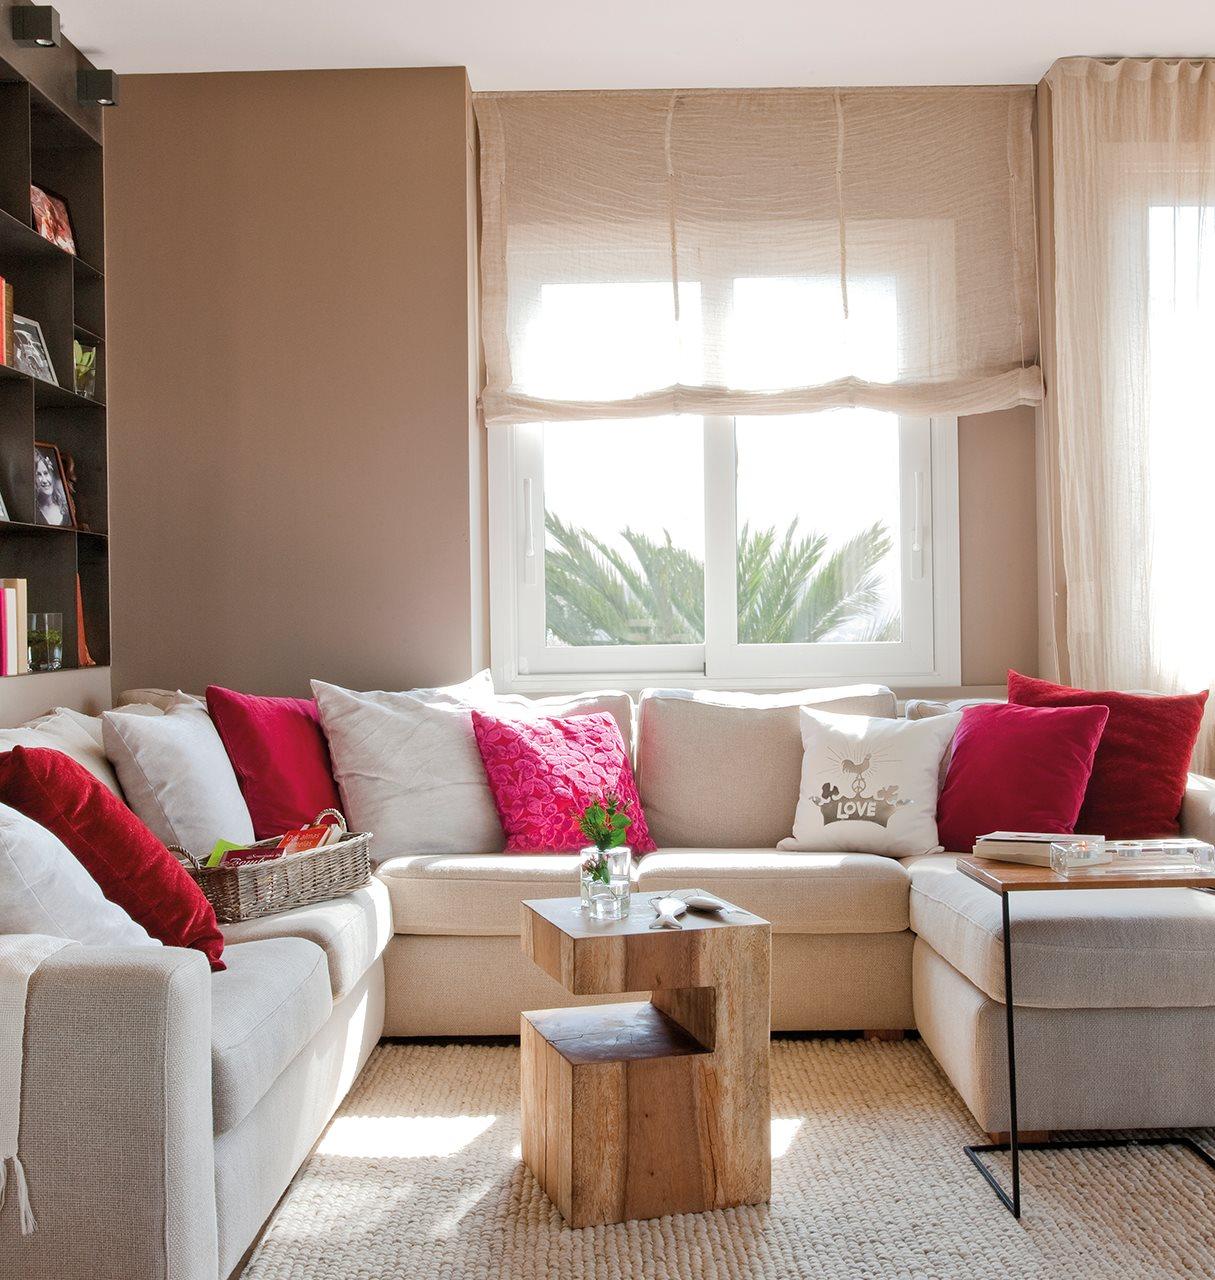 Sofa para cuarto elegant ikea with sofa para cuarto - Sofa para cuarto ...